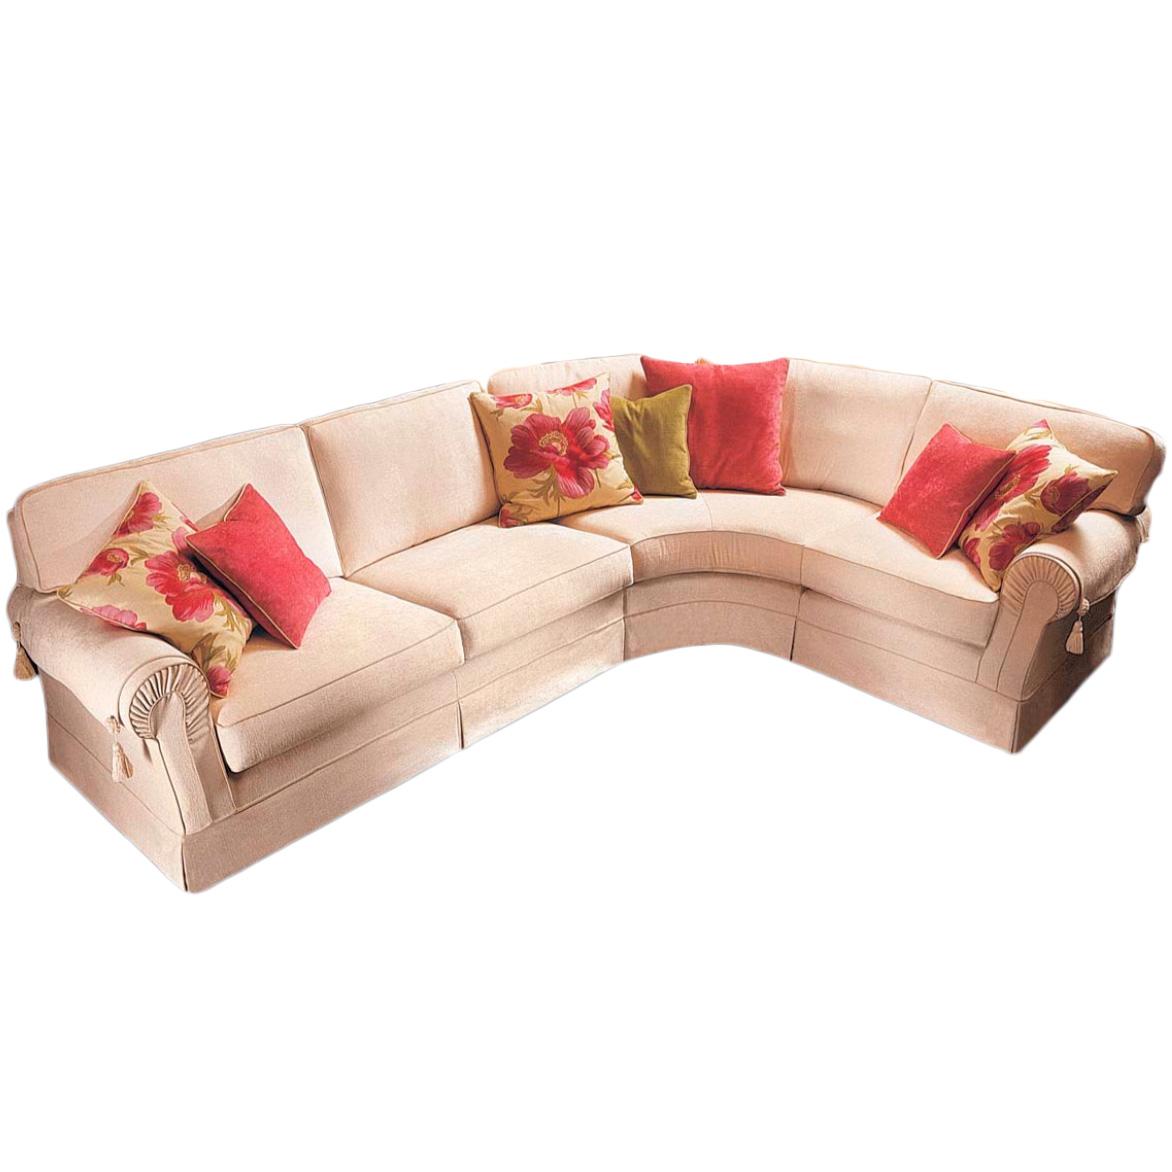 Cava_Ritz_Modular_Sofa